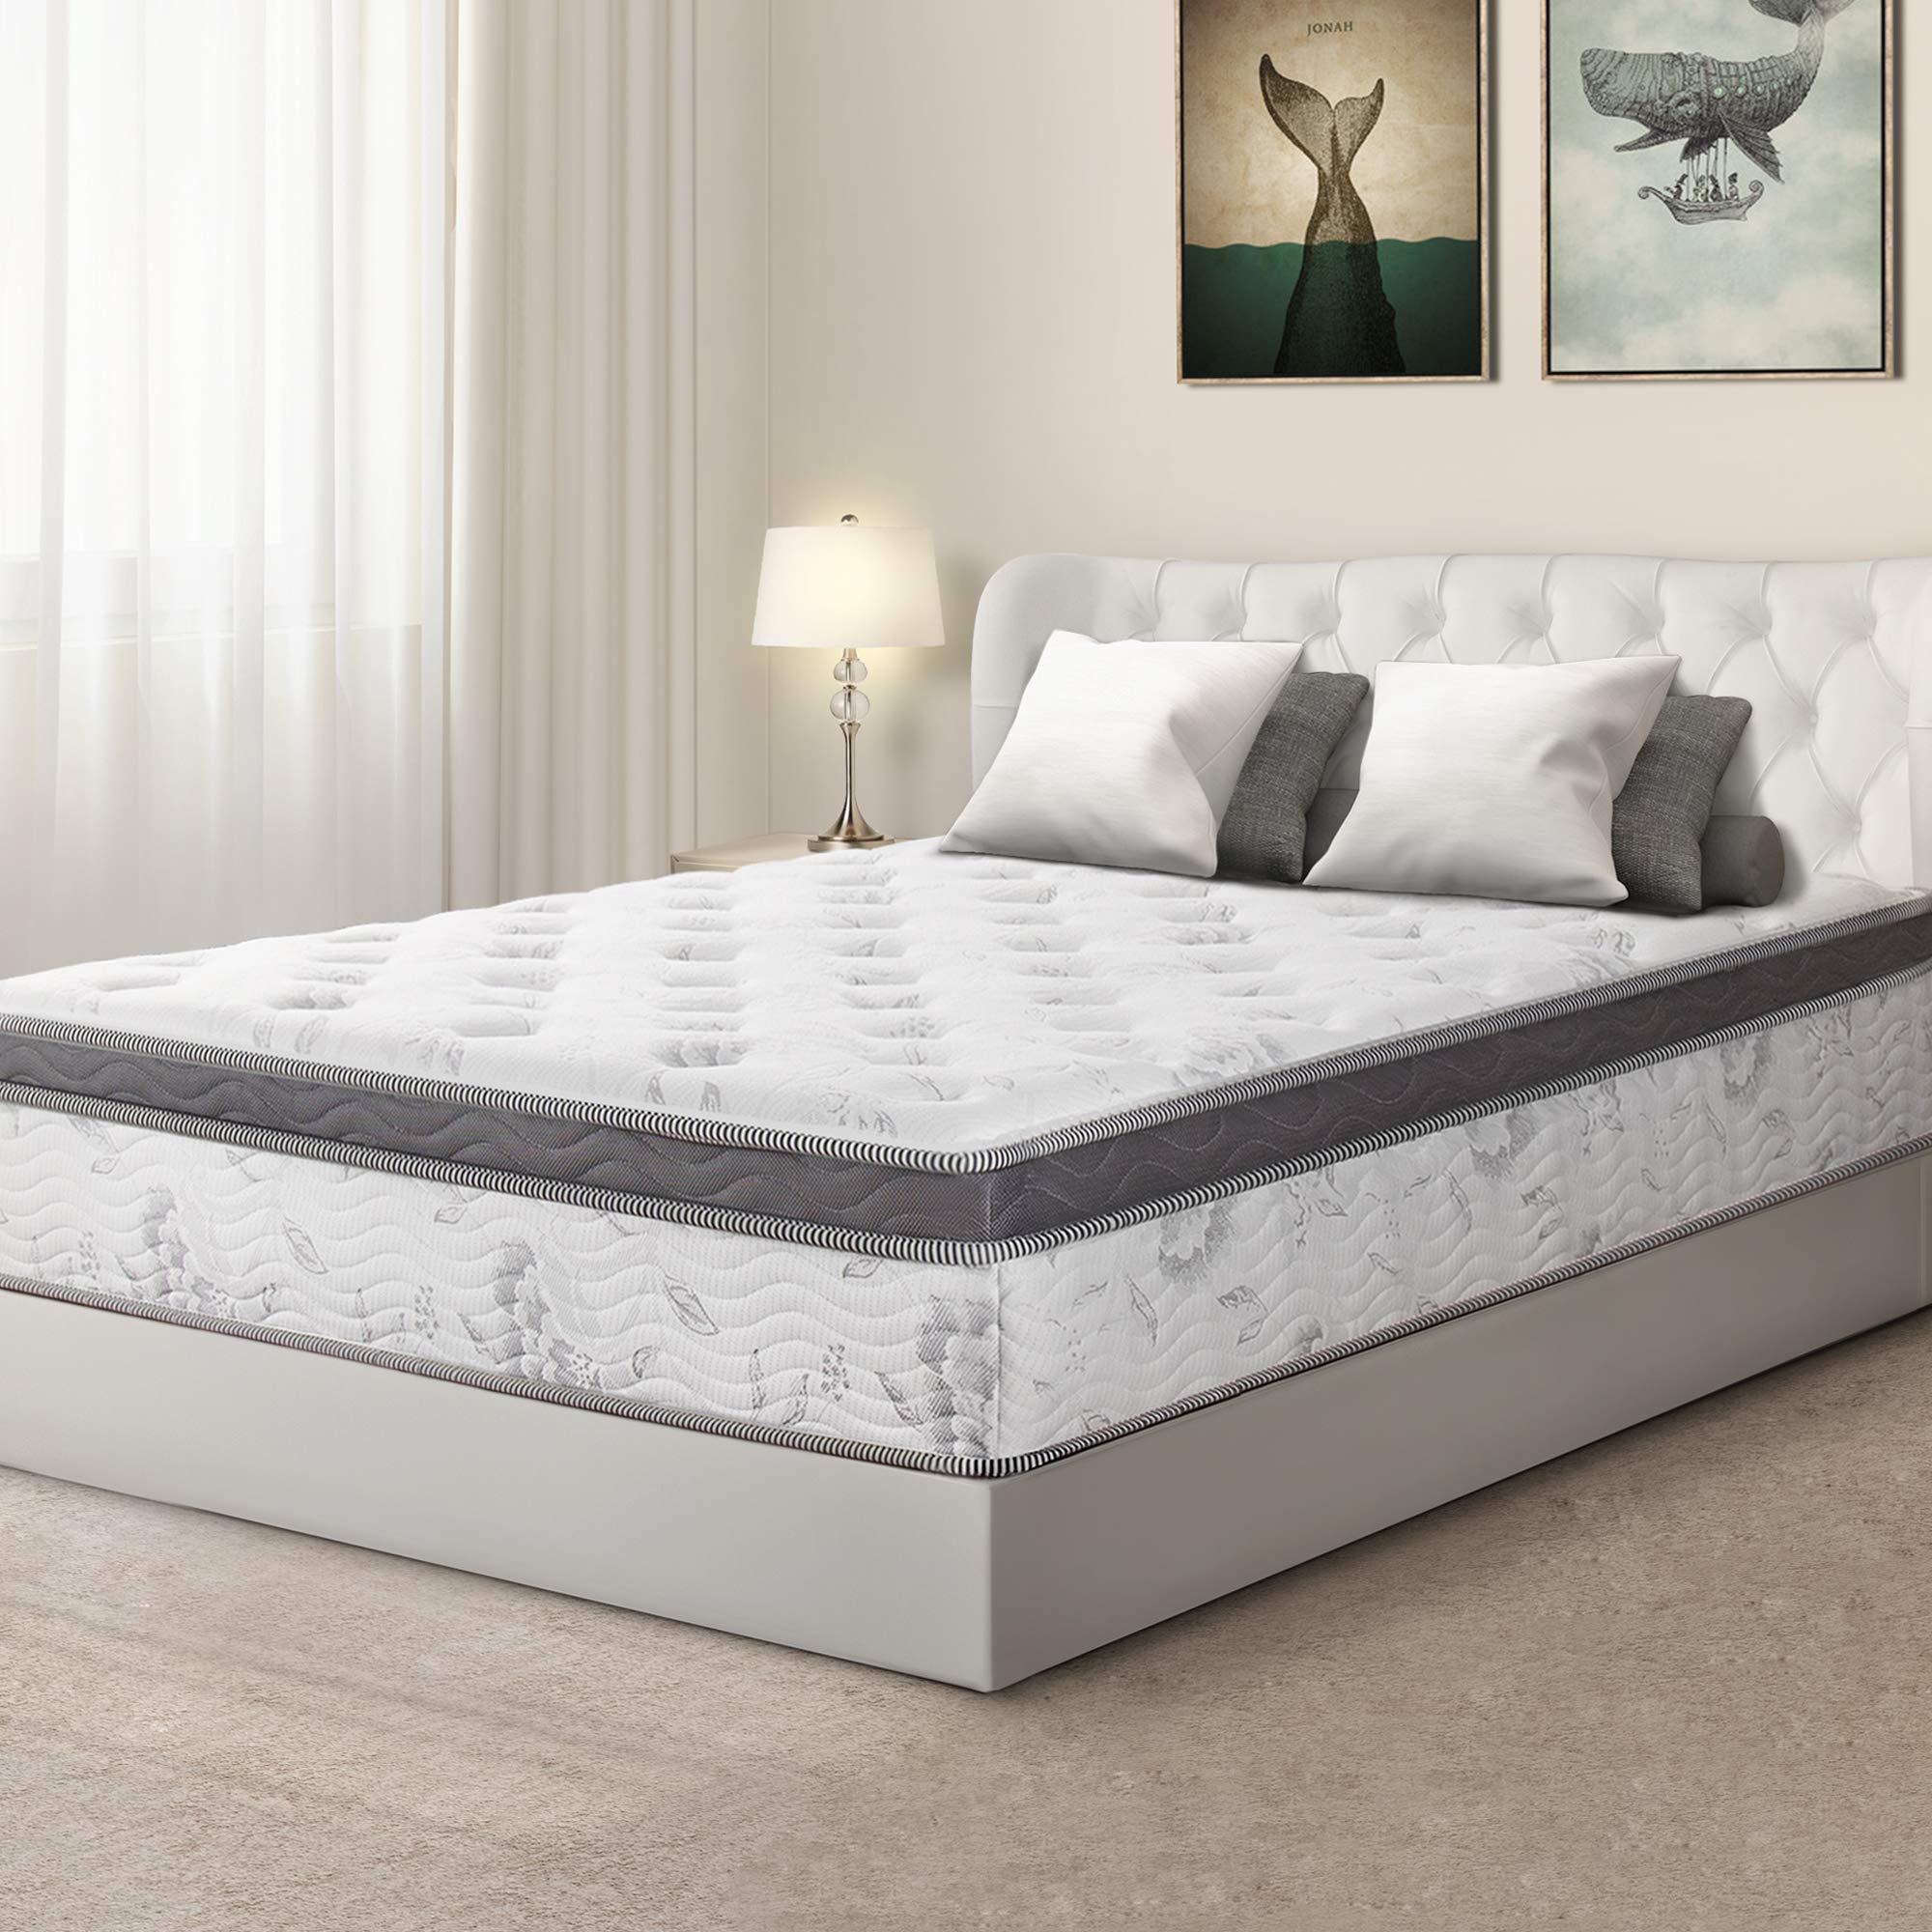 Olee Sleep 12 inch Hybrid Euro Box Top Pocket Spring Mattress (King) by Olee Sleep